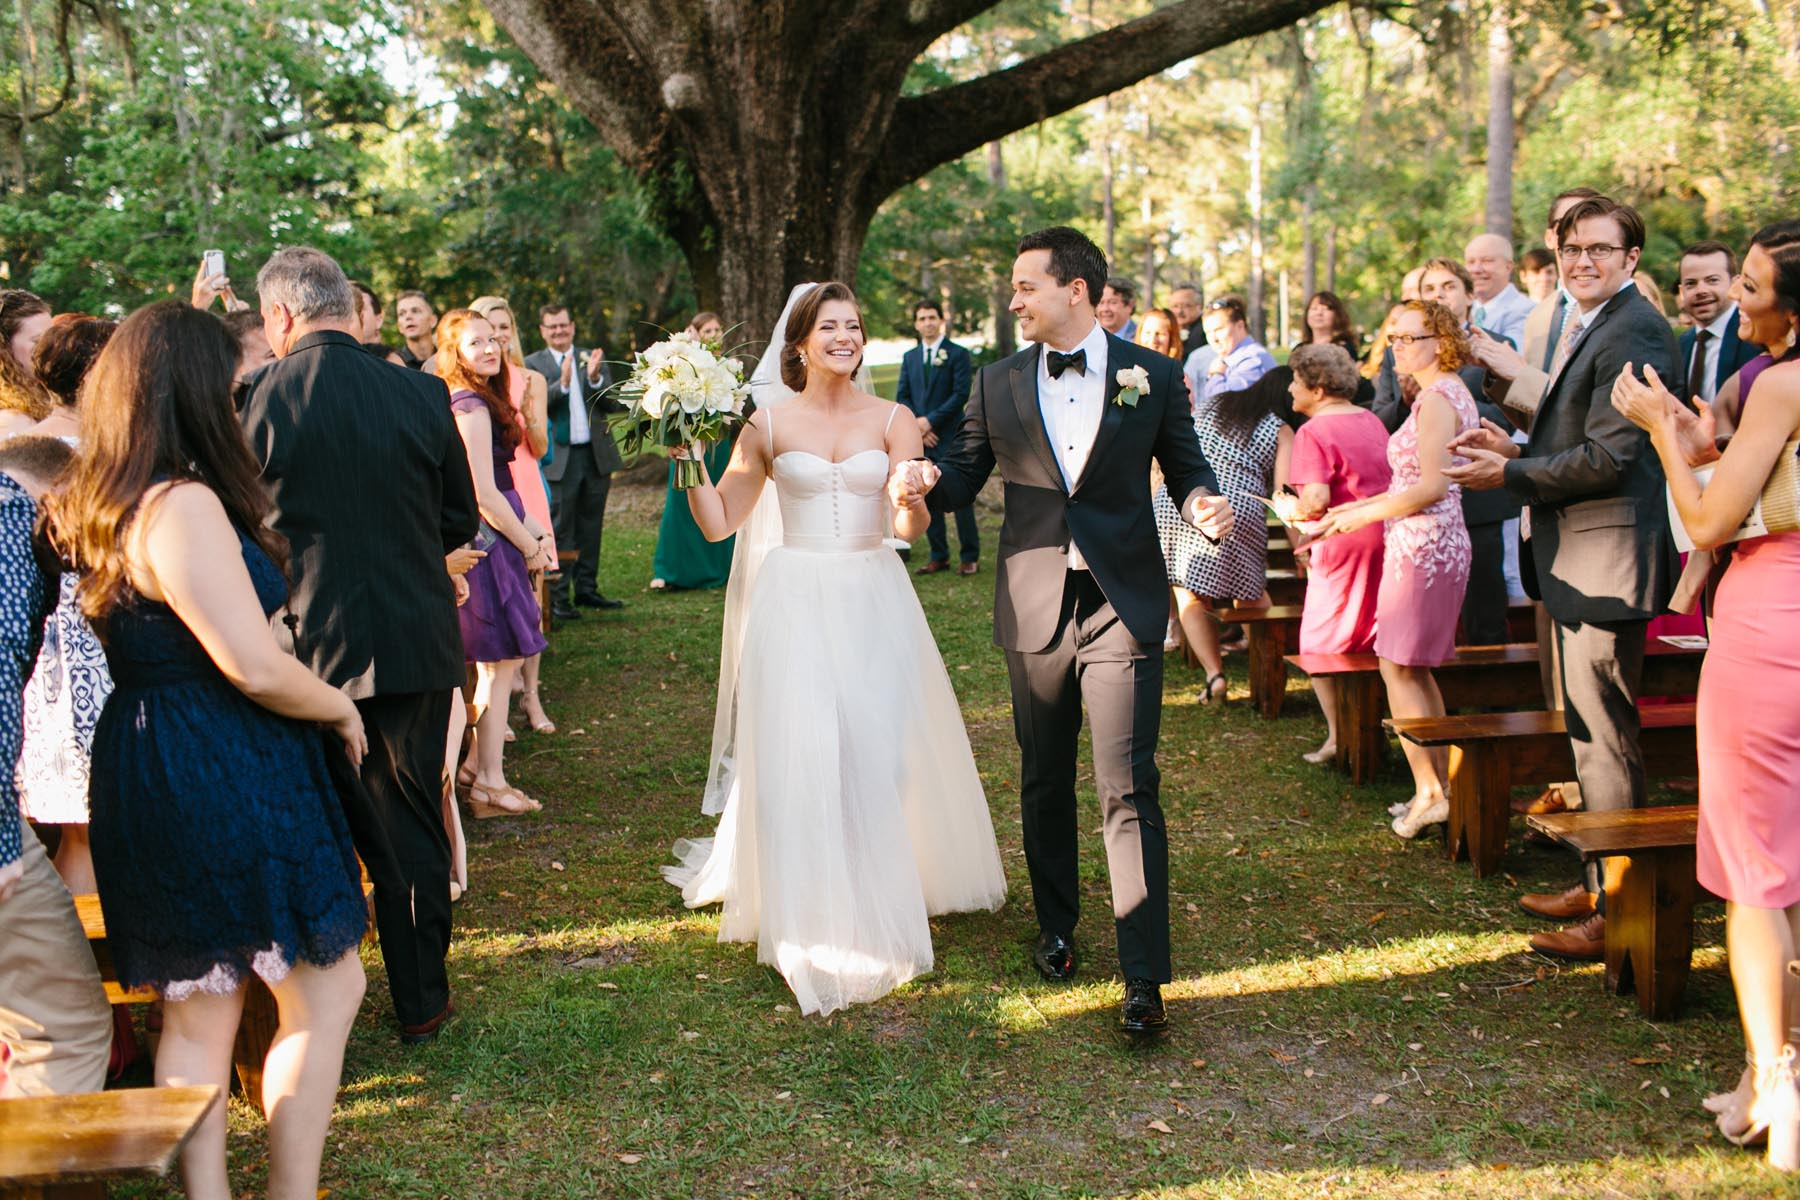 lowry wedding blog eden garden florida wedding-76